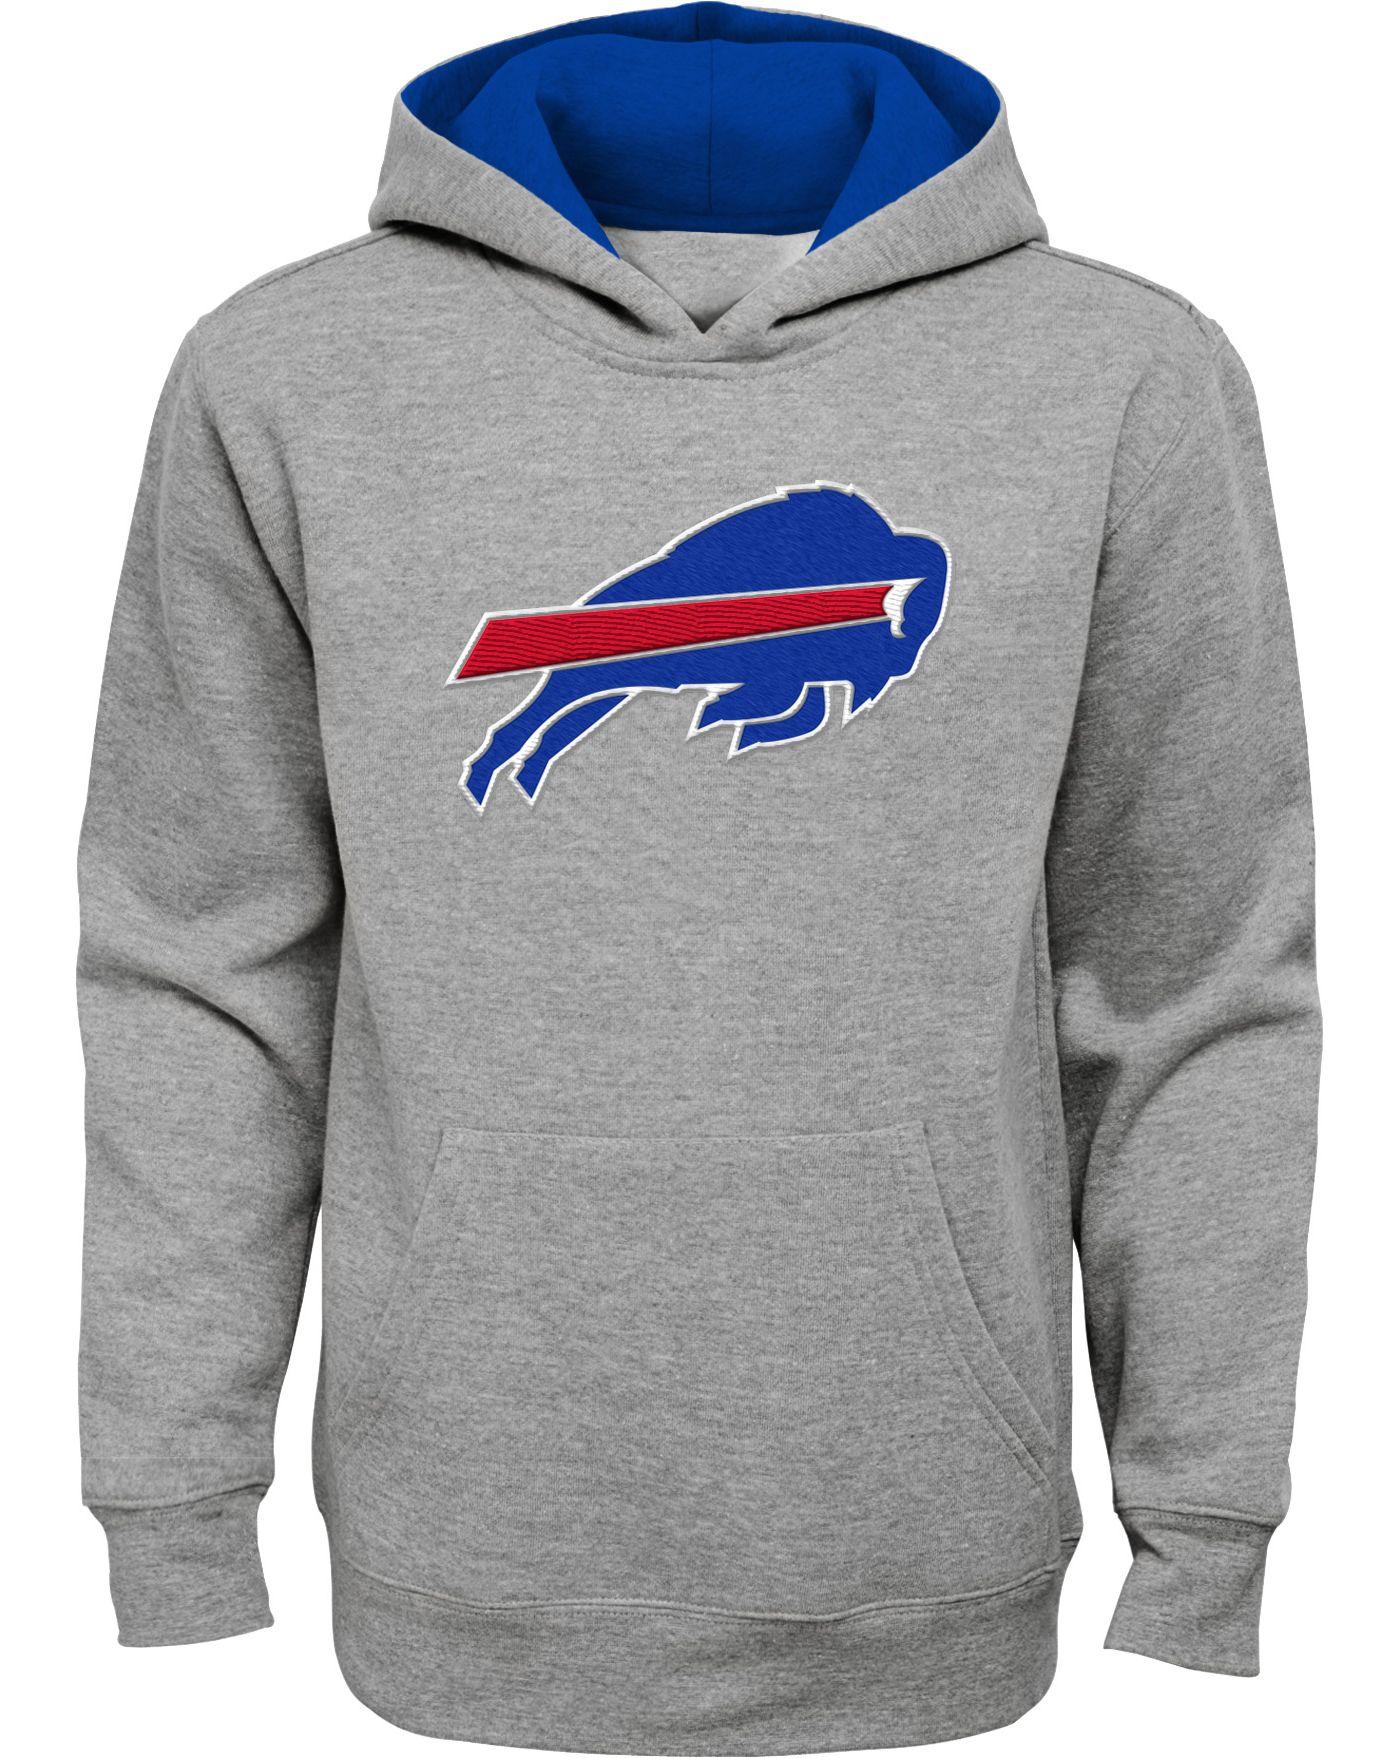 NFL Team Apparel Youth Buffalo Bills Prime Grey Pullover Hoodie